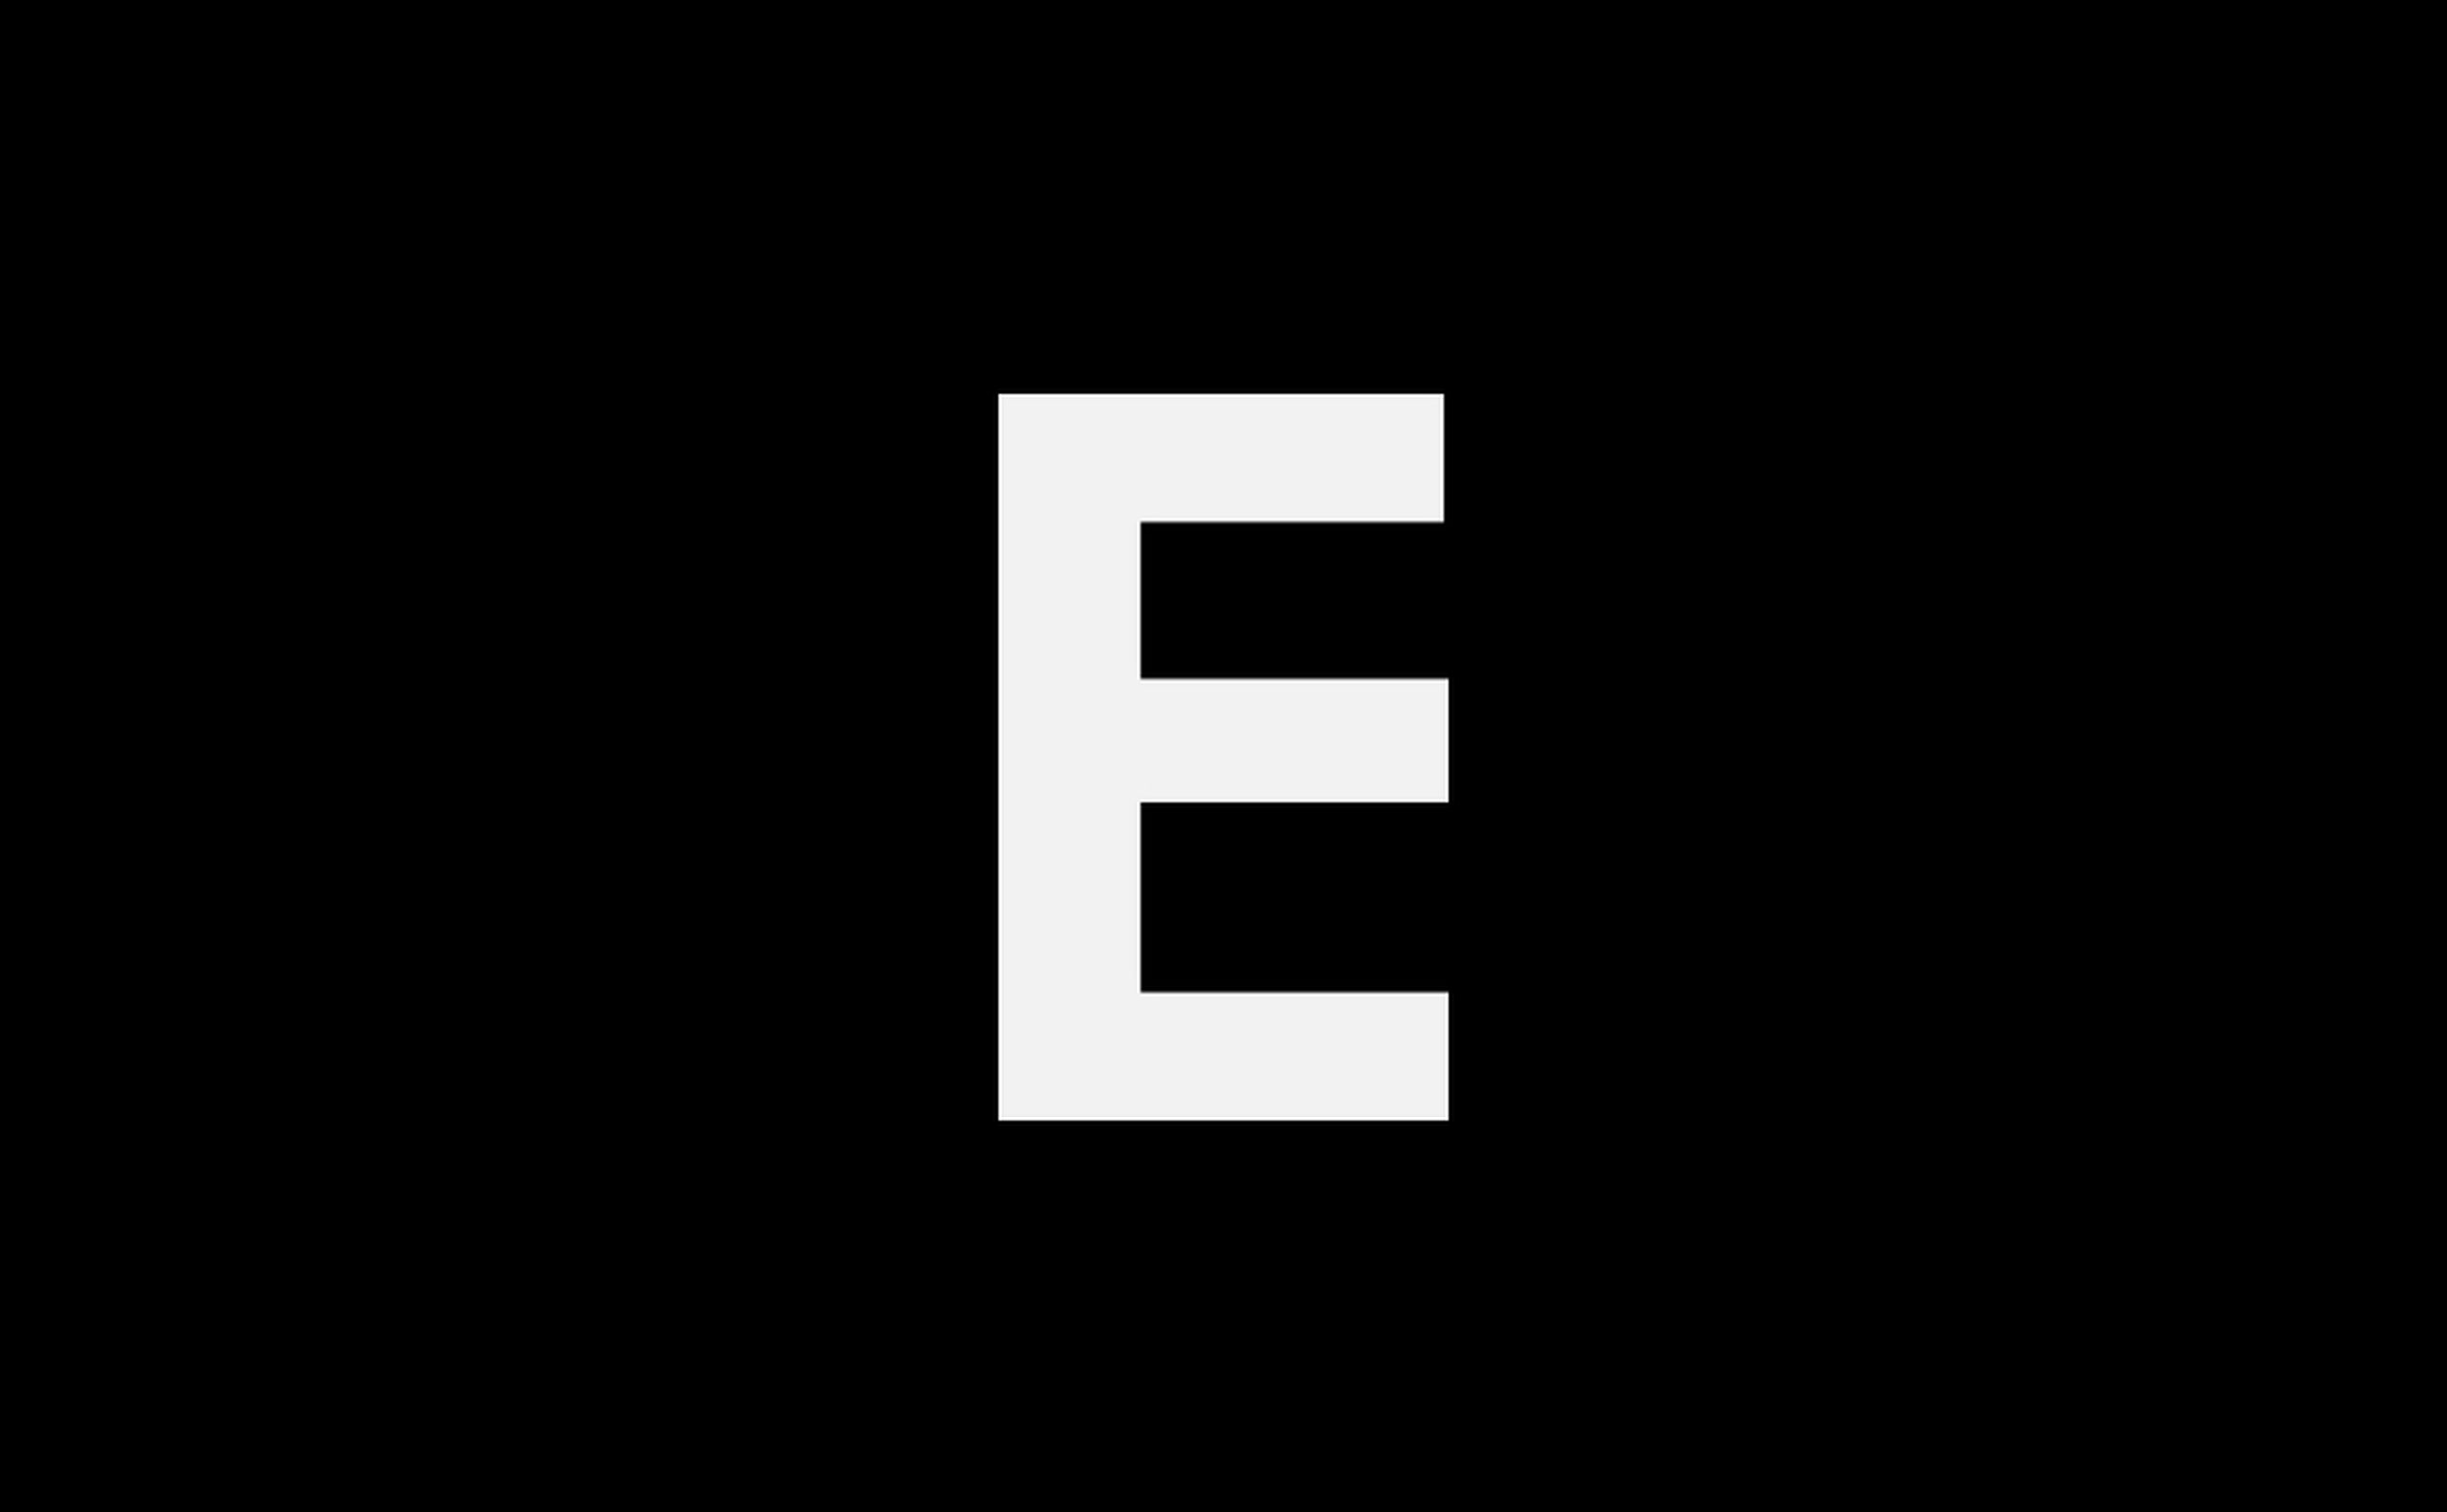 Candies on chocolate cake